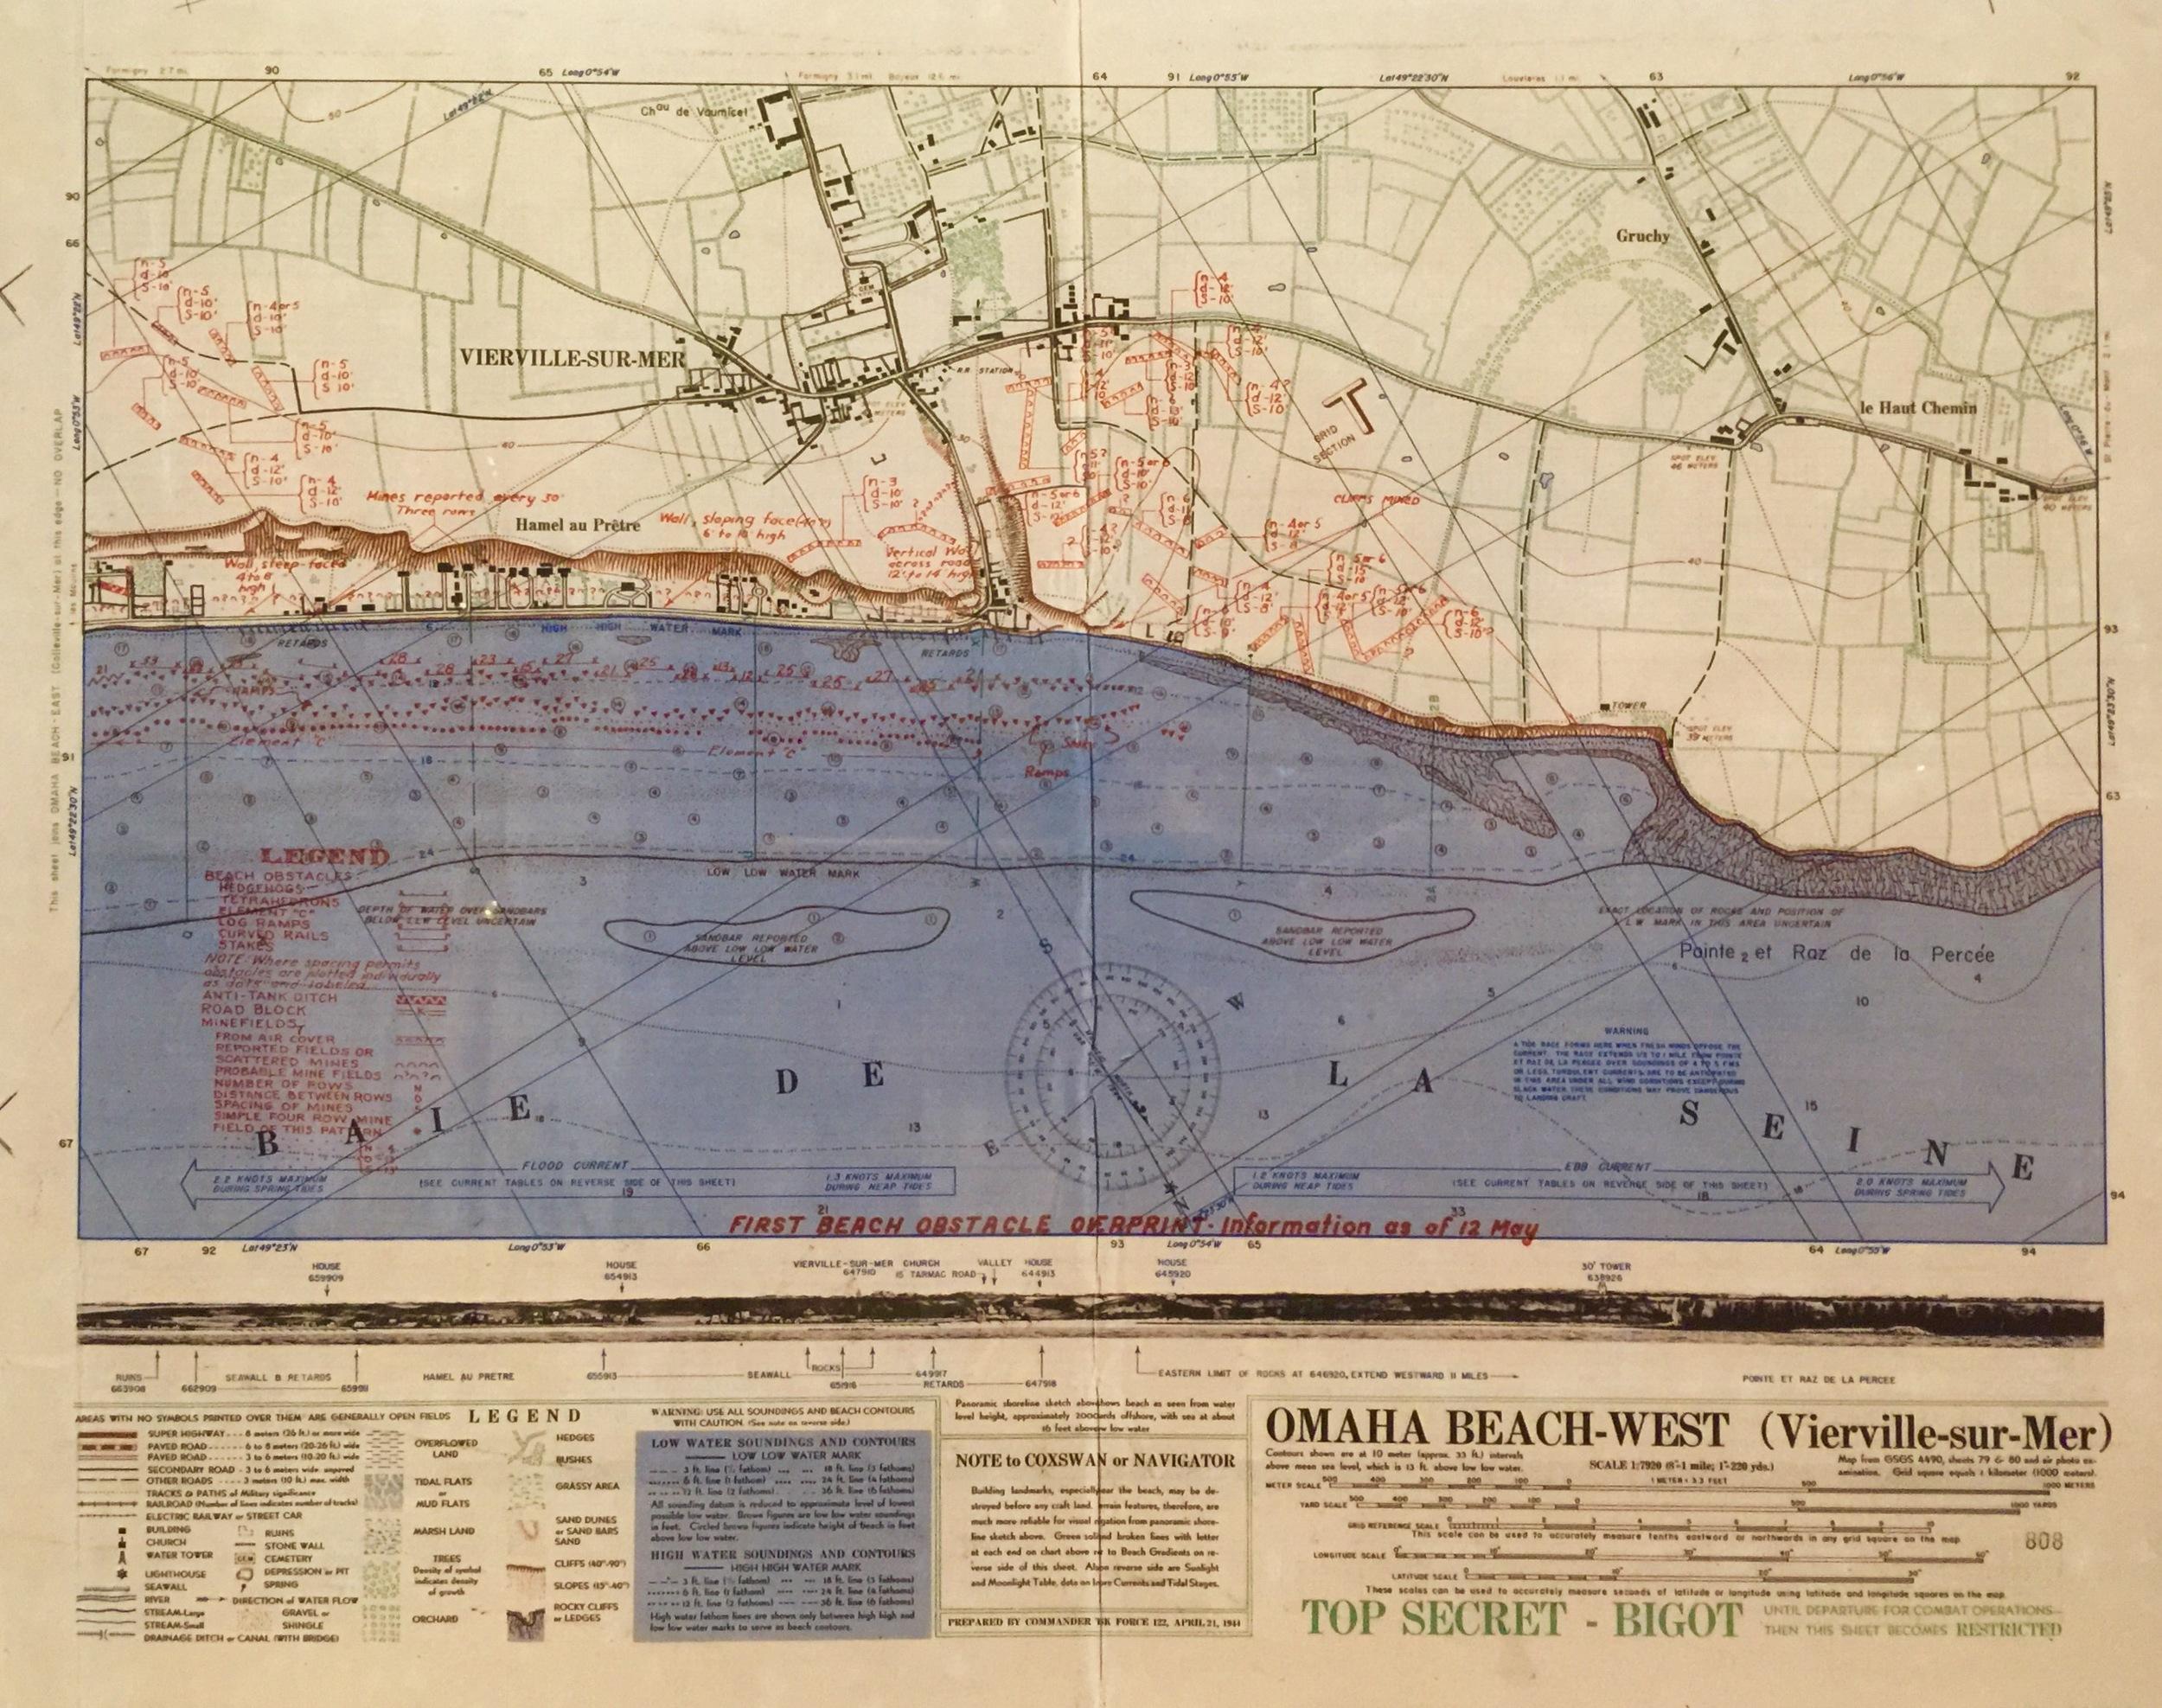 Omaha Beach - West invasion map